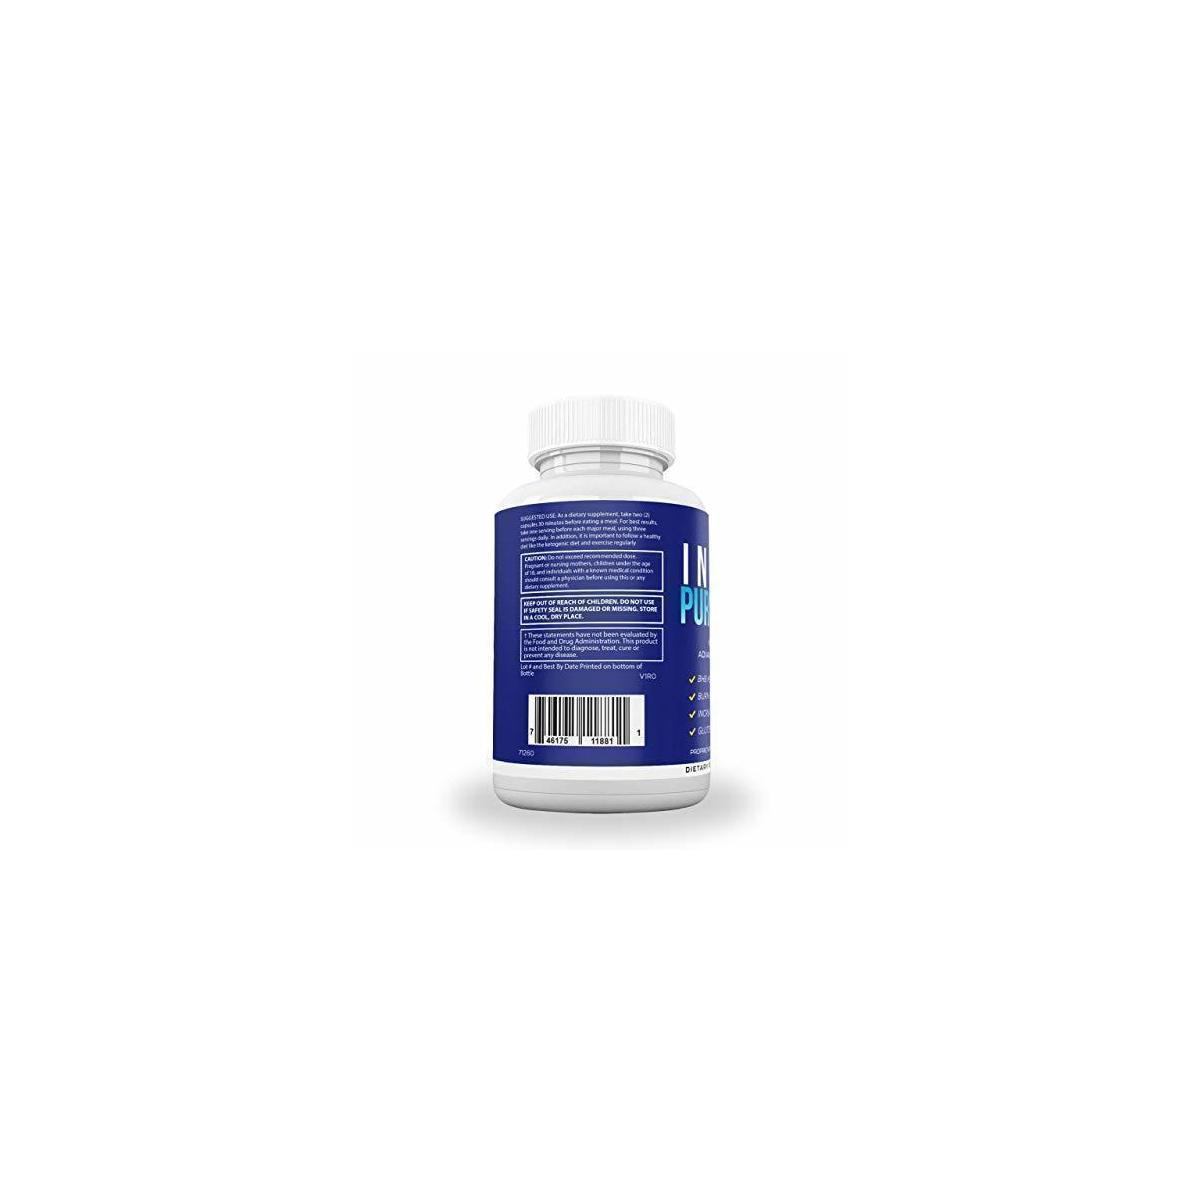 Make $2 every purchase! - Keto Pills